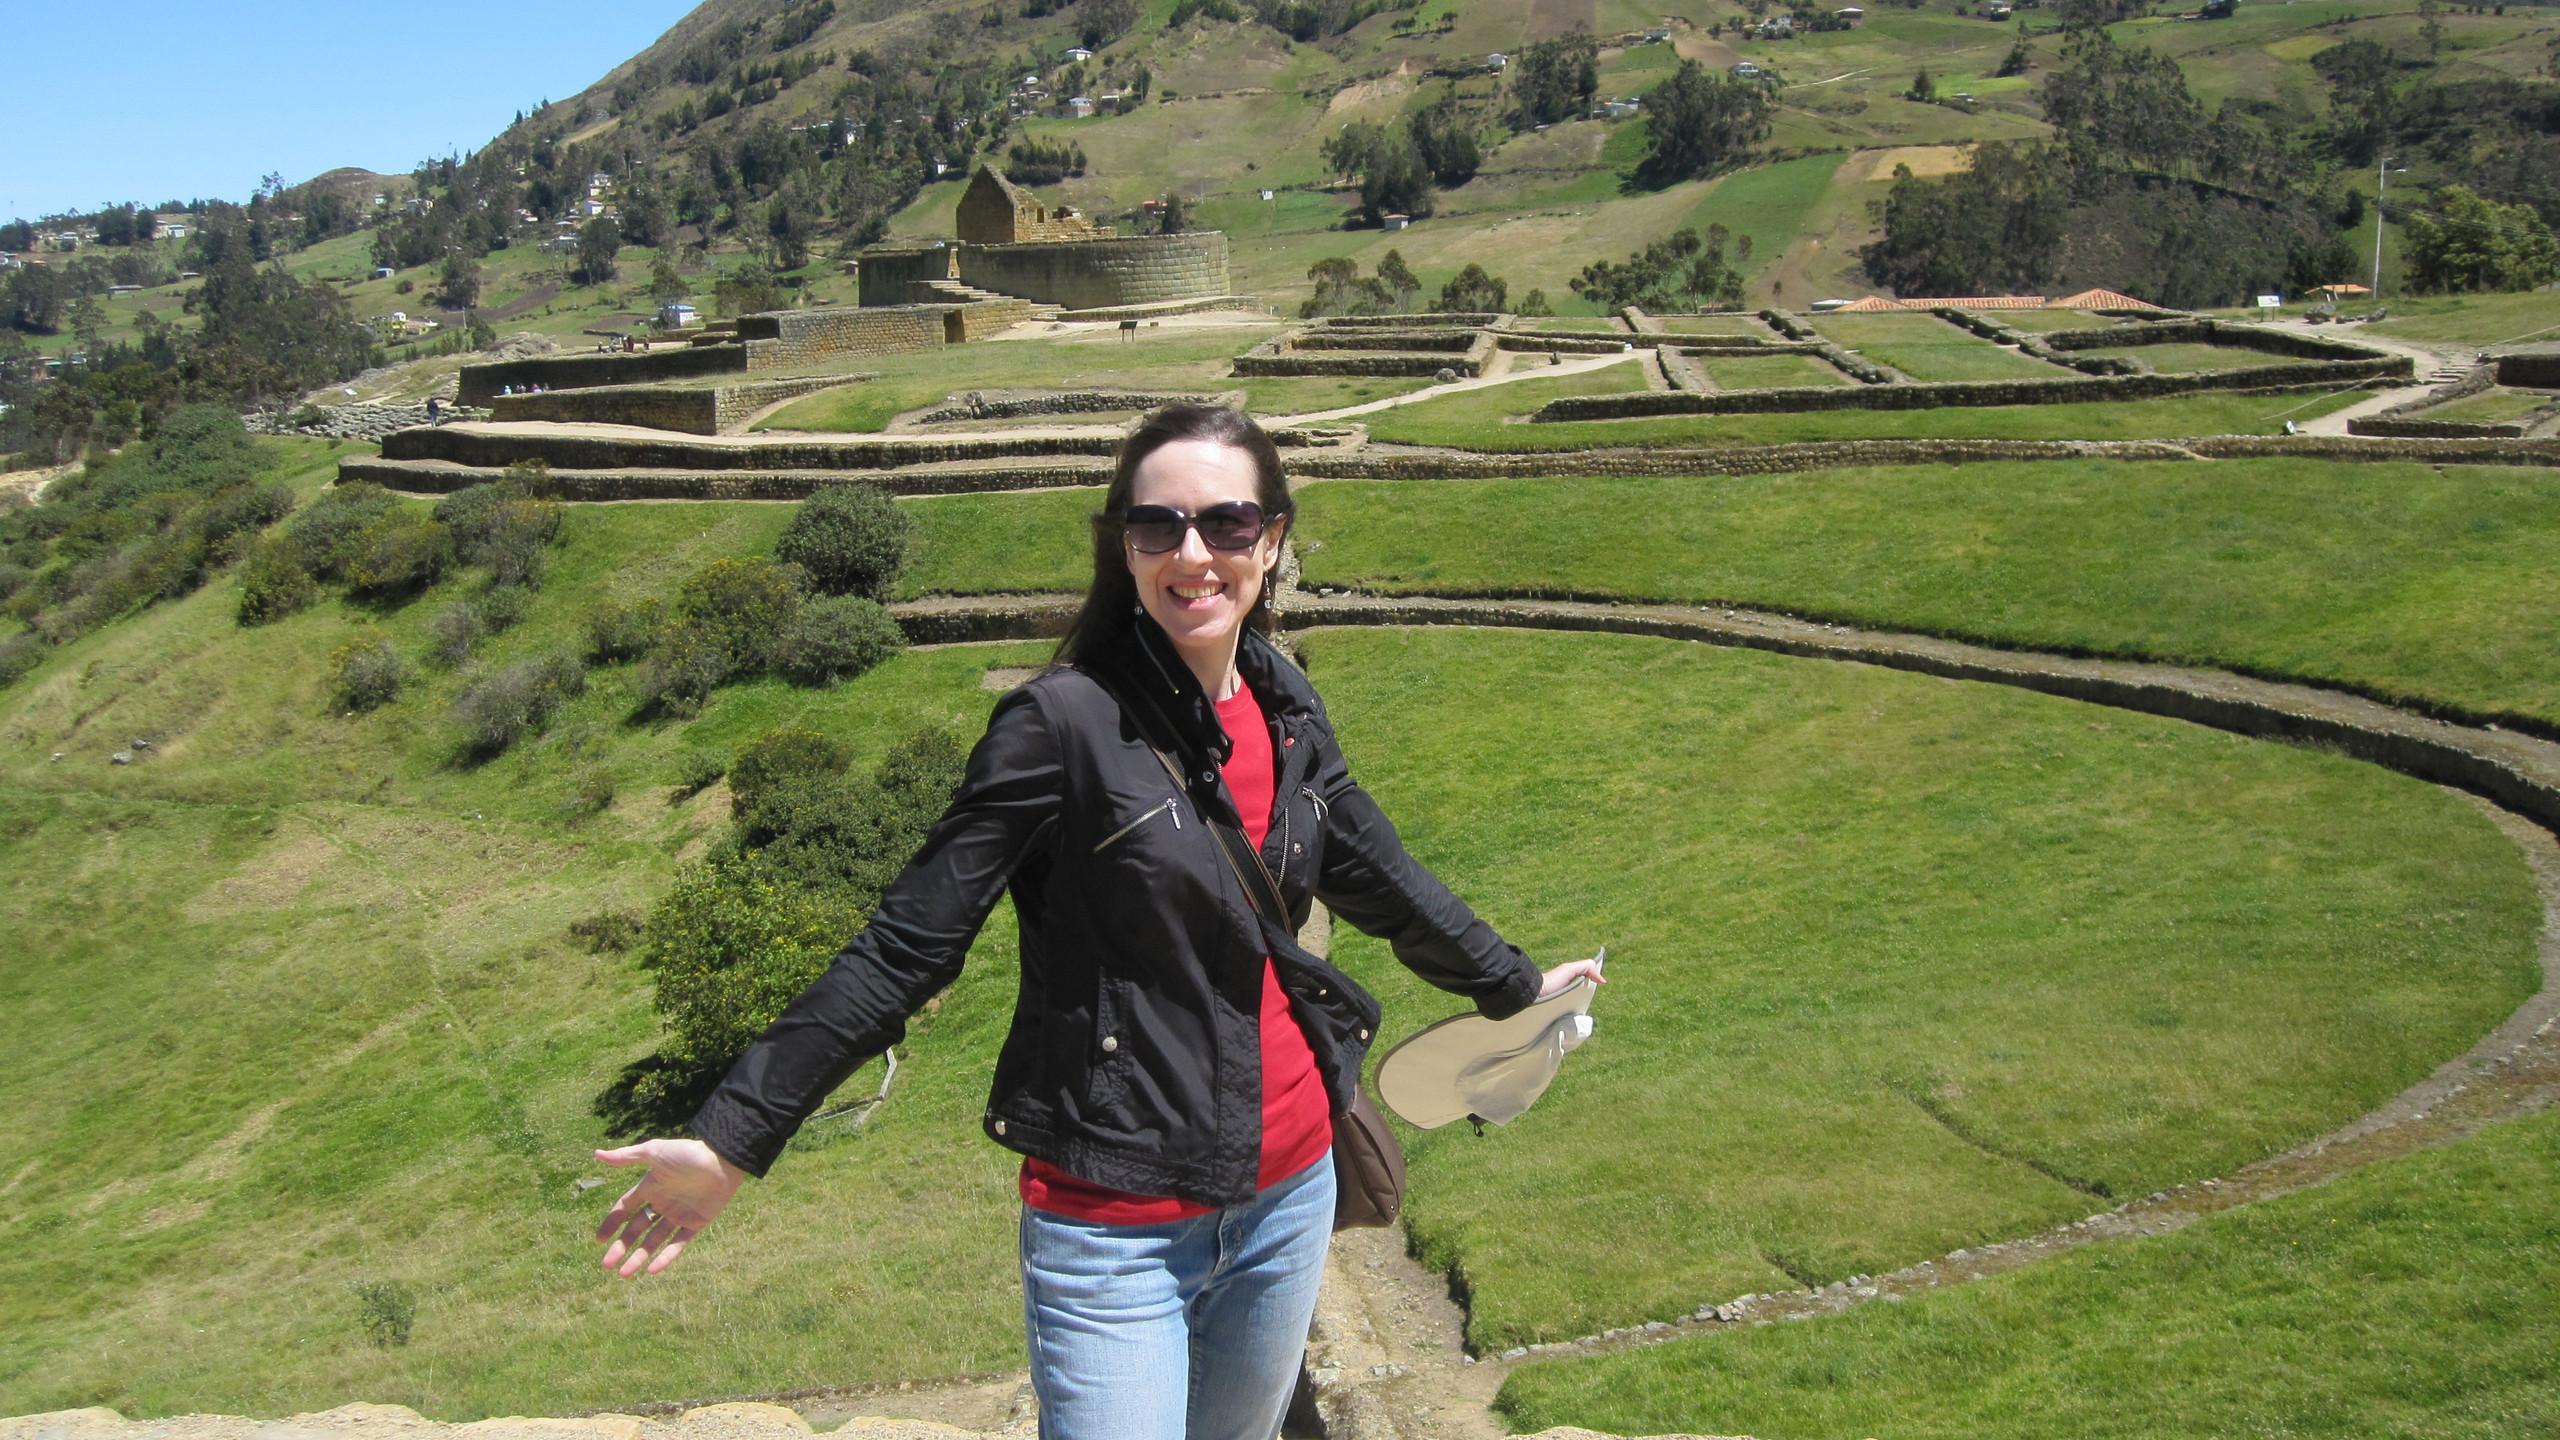 The Ingapirca ruins